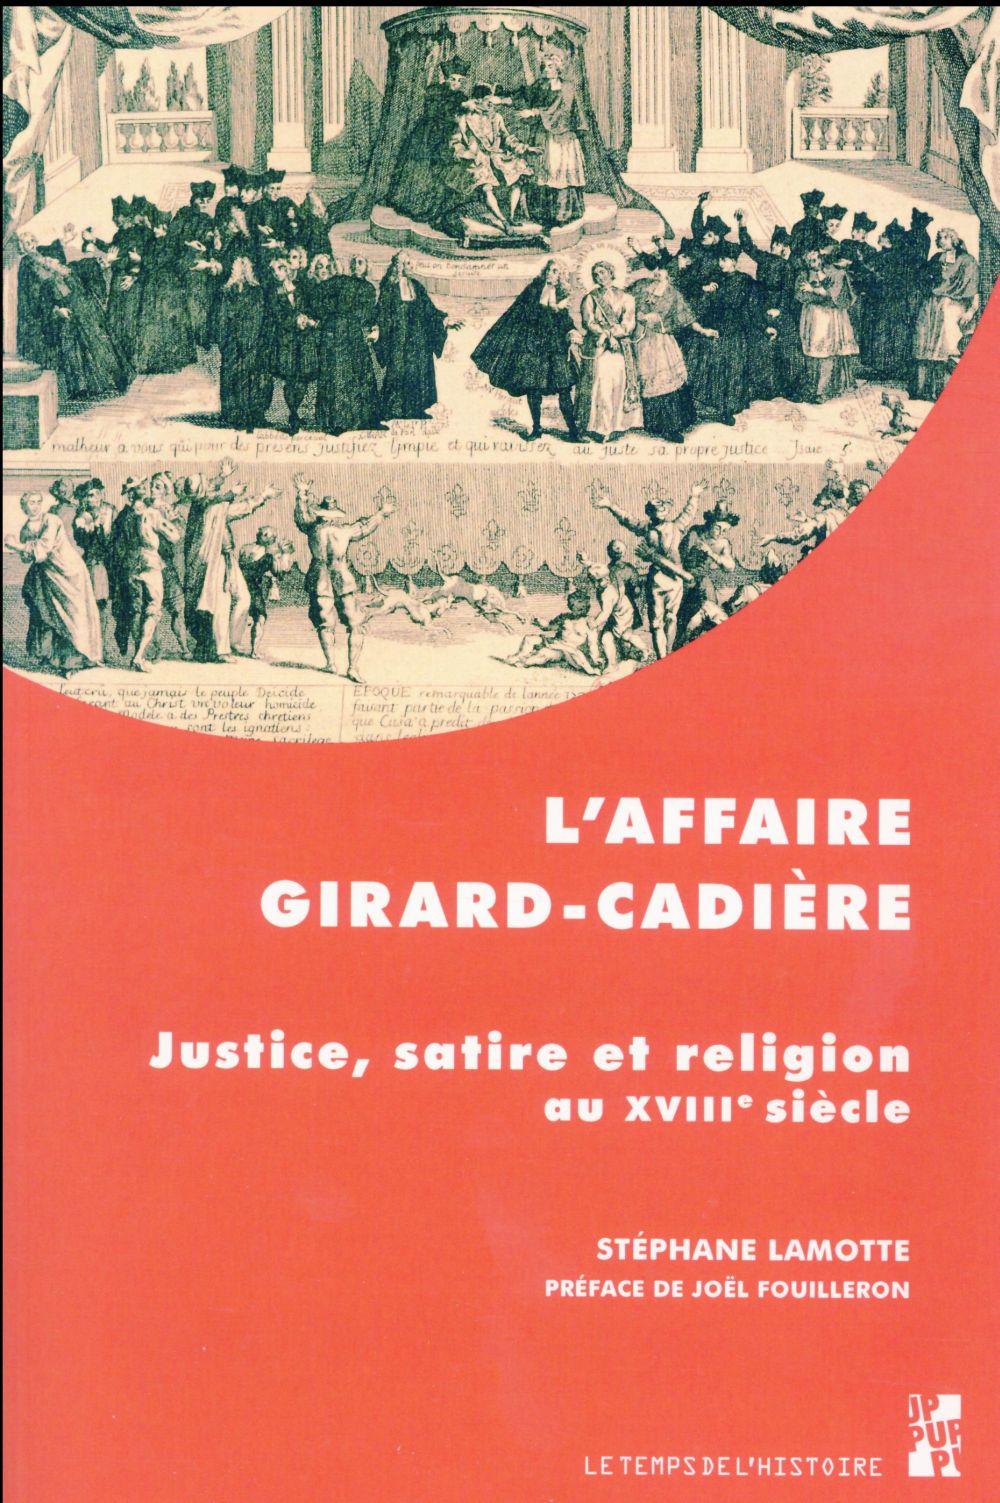 AFFAIRE GIRARD CADIERE